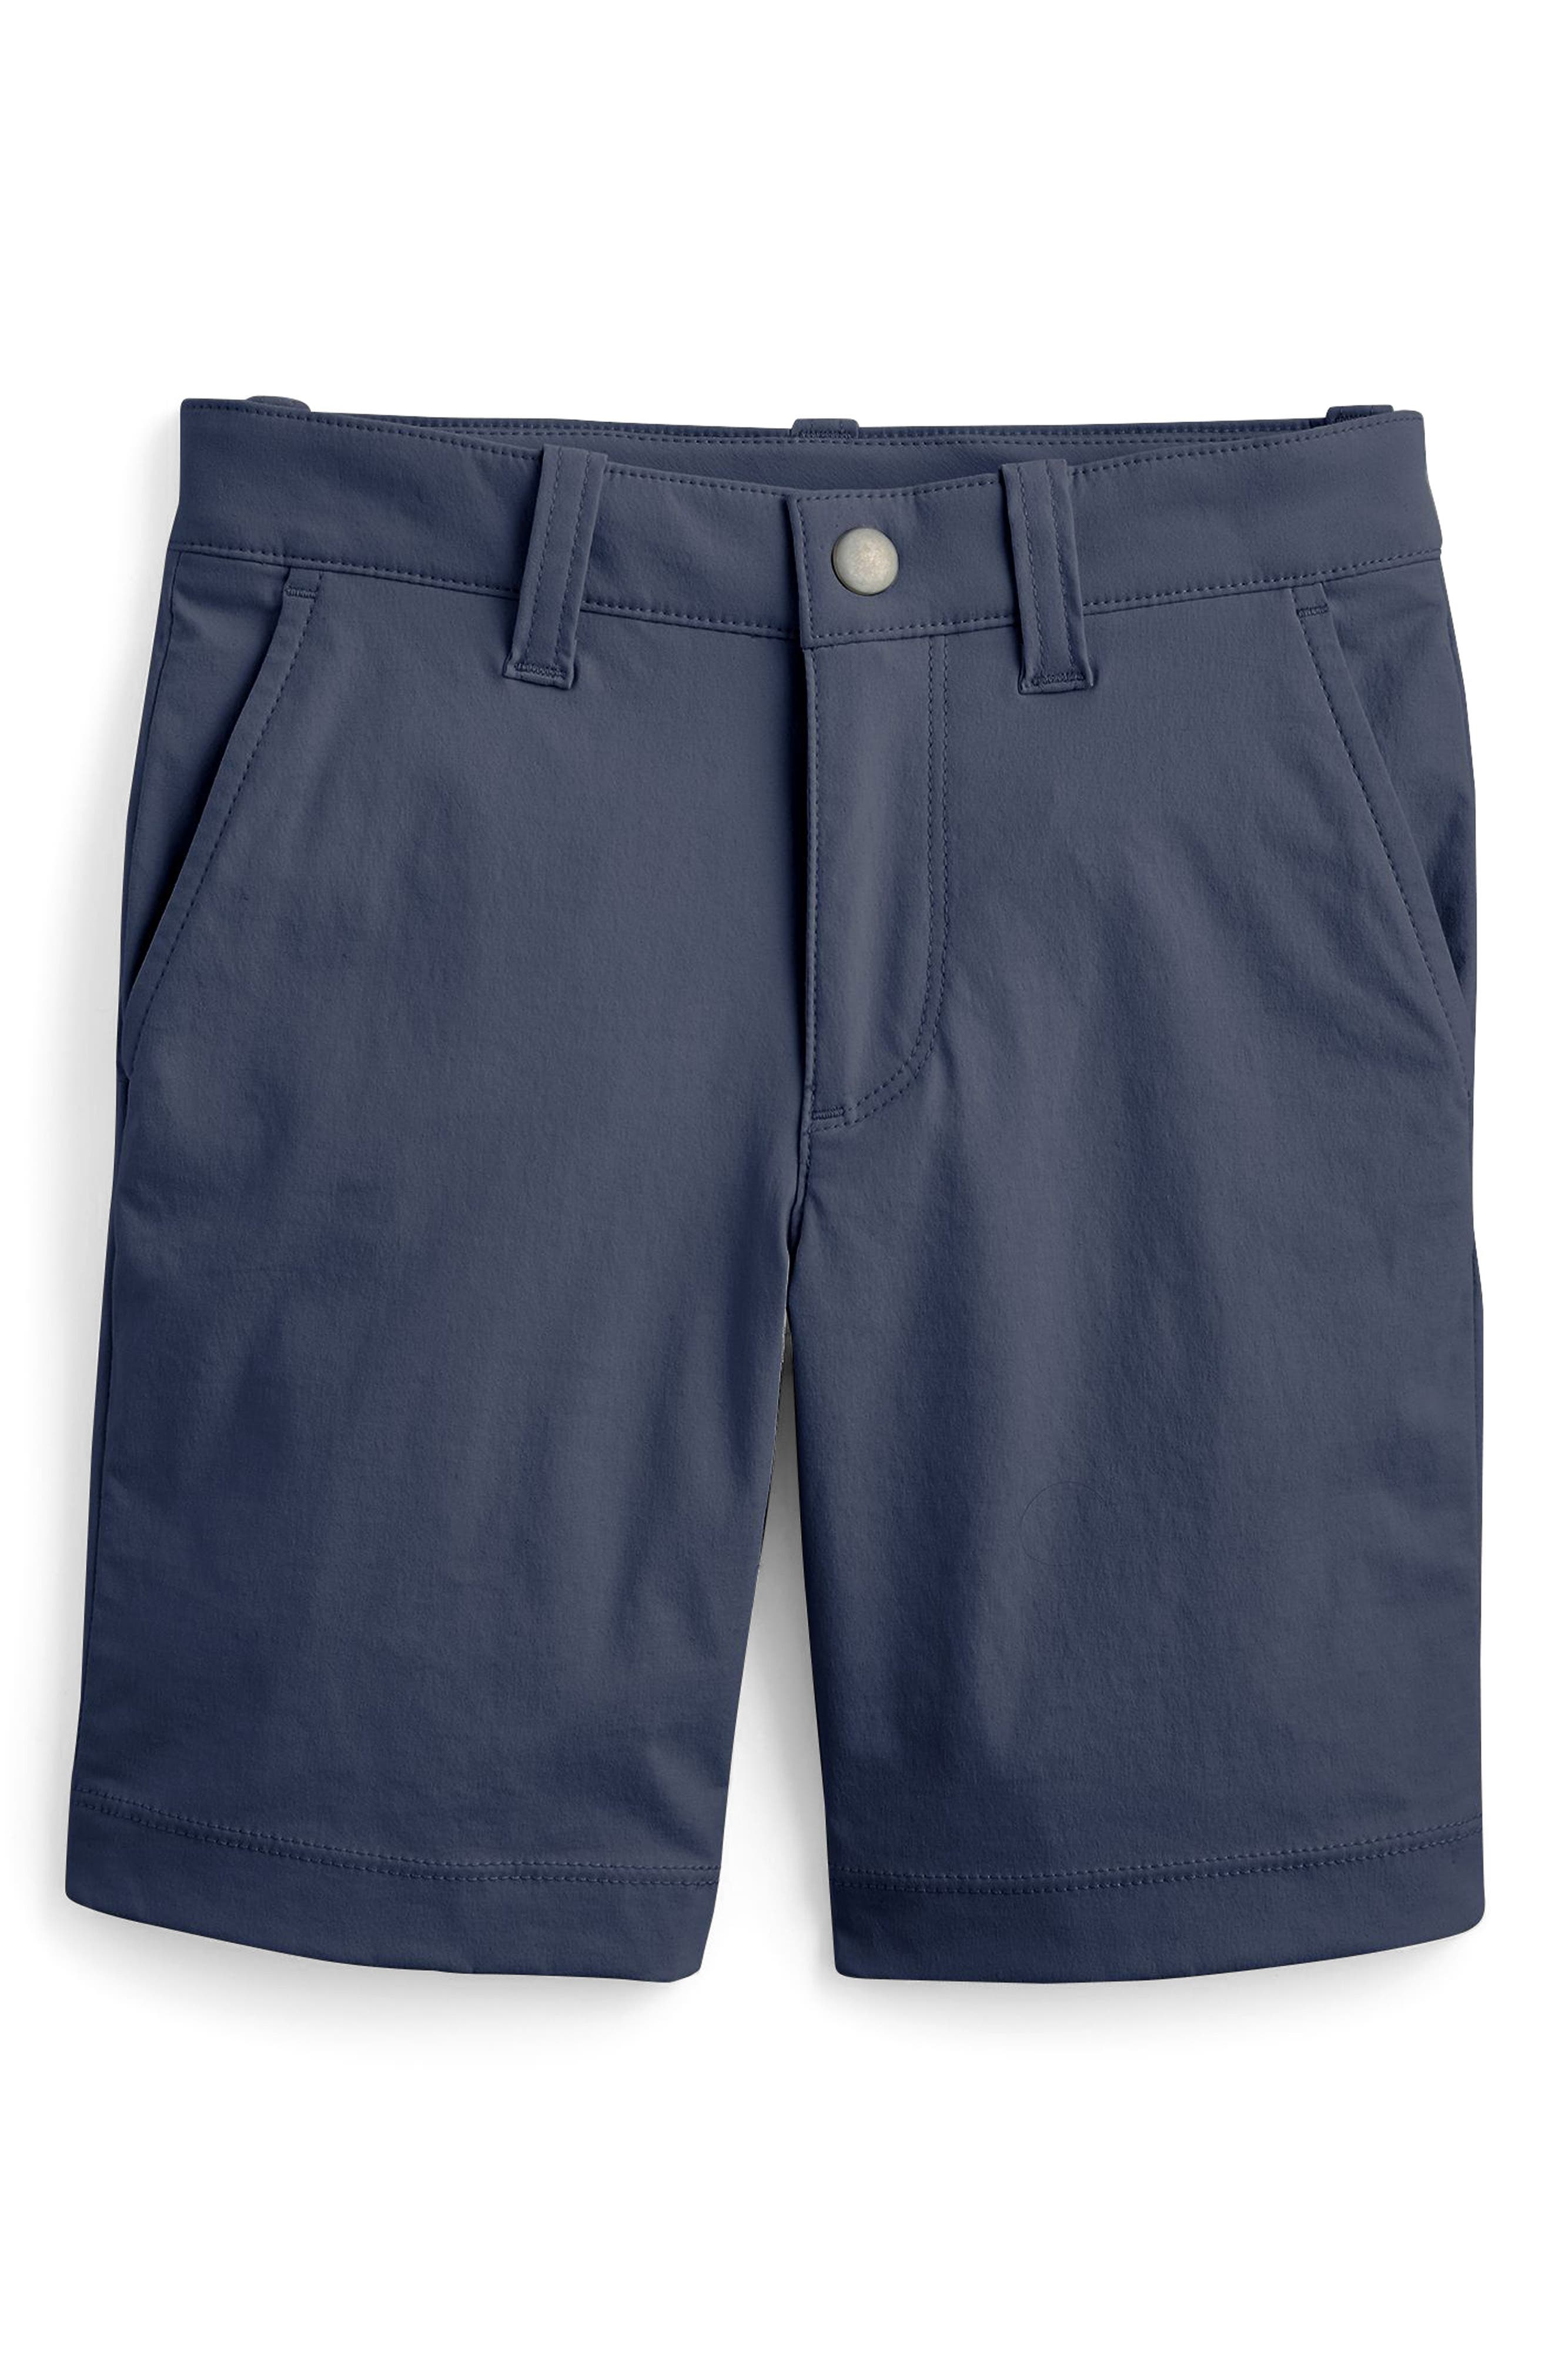 Tech Shorts,                         Main,                         color, Navy